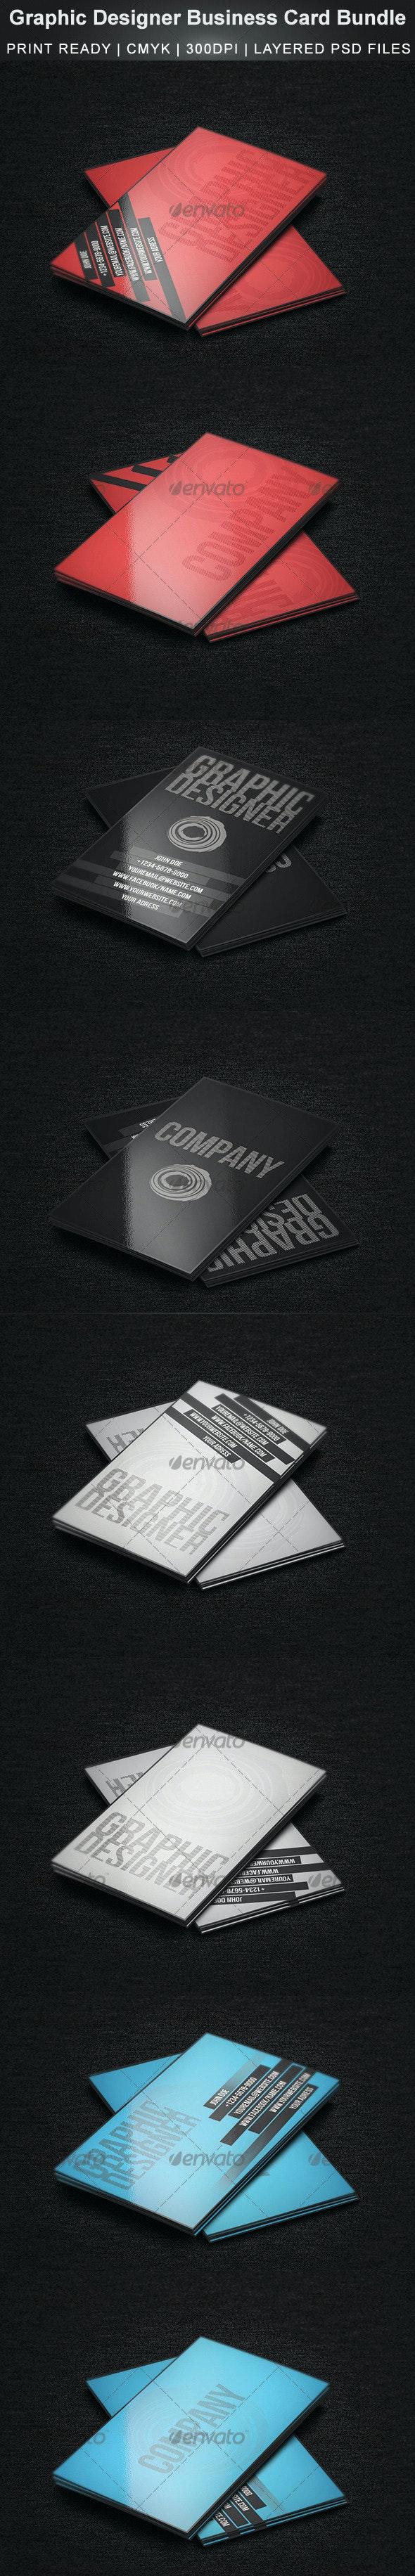 Graphic Designer Business Card Bundle - Creative Business Cards